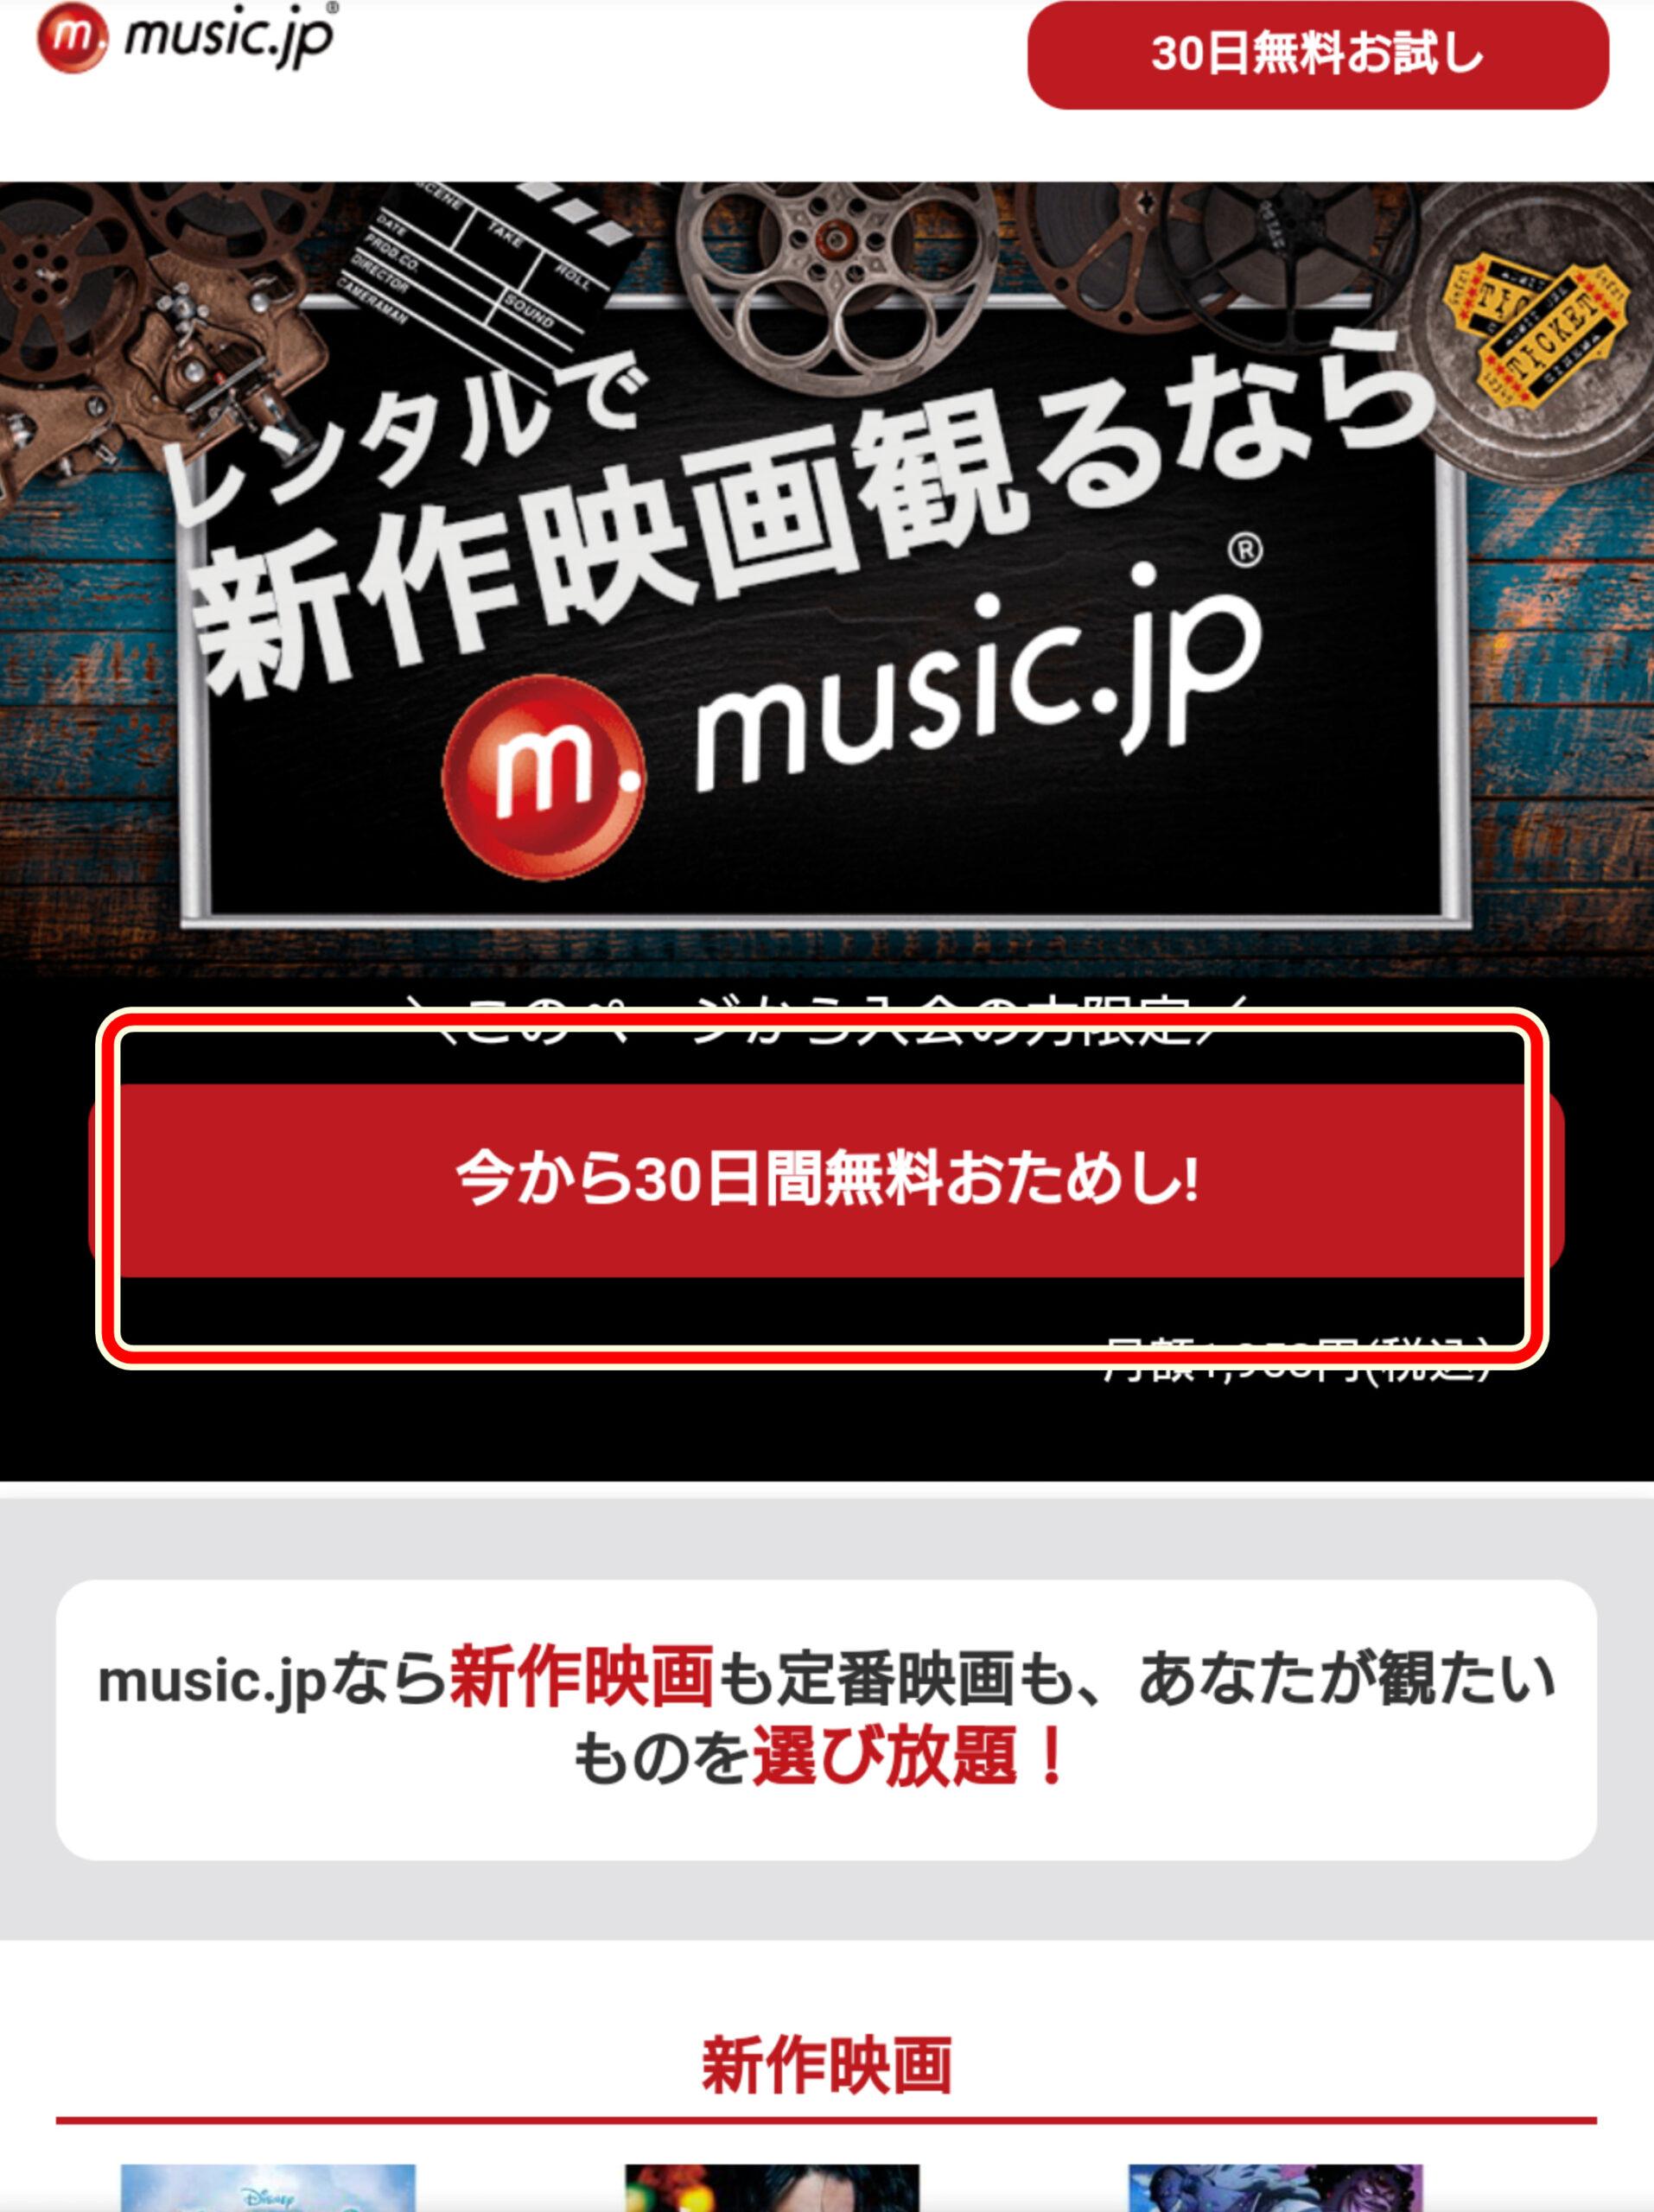 music.jp登録 (1)